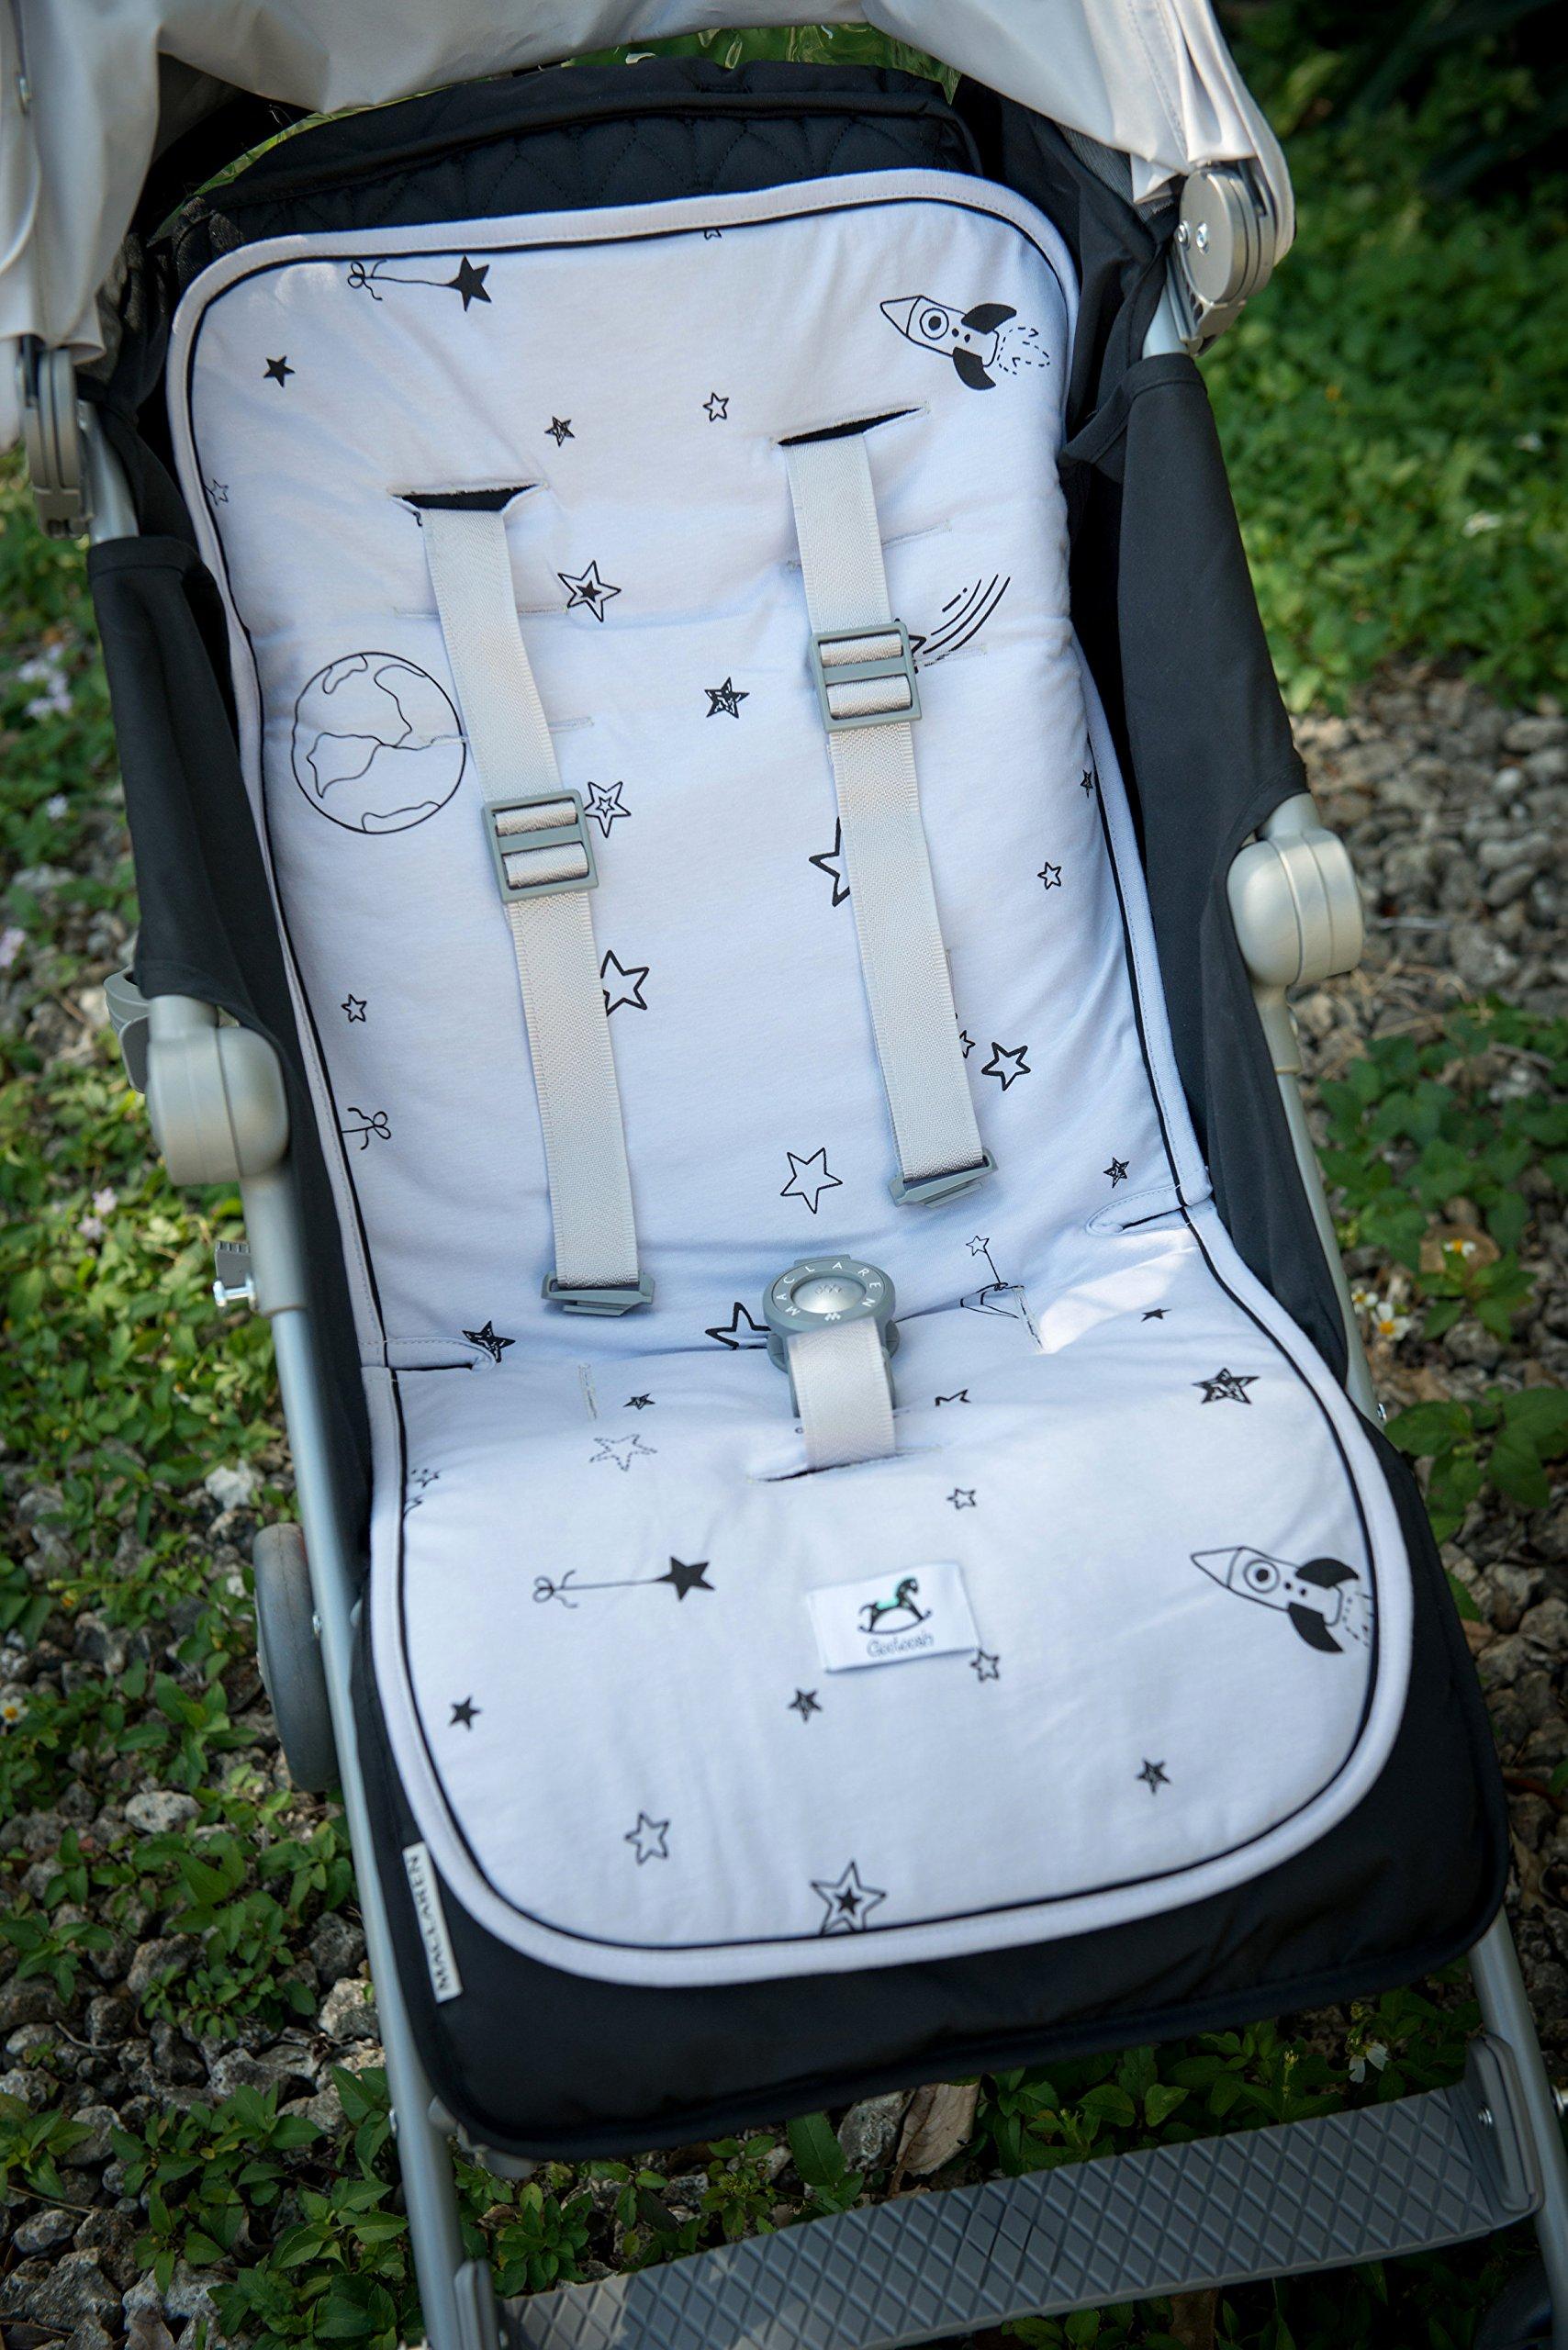 Stroller Liner pad/car seat Liner,Galaxy Star, Origami (Grey) by Gootoosh